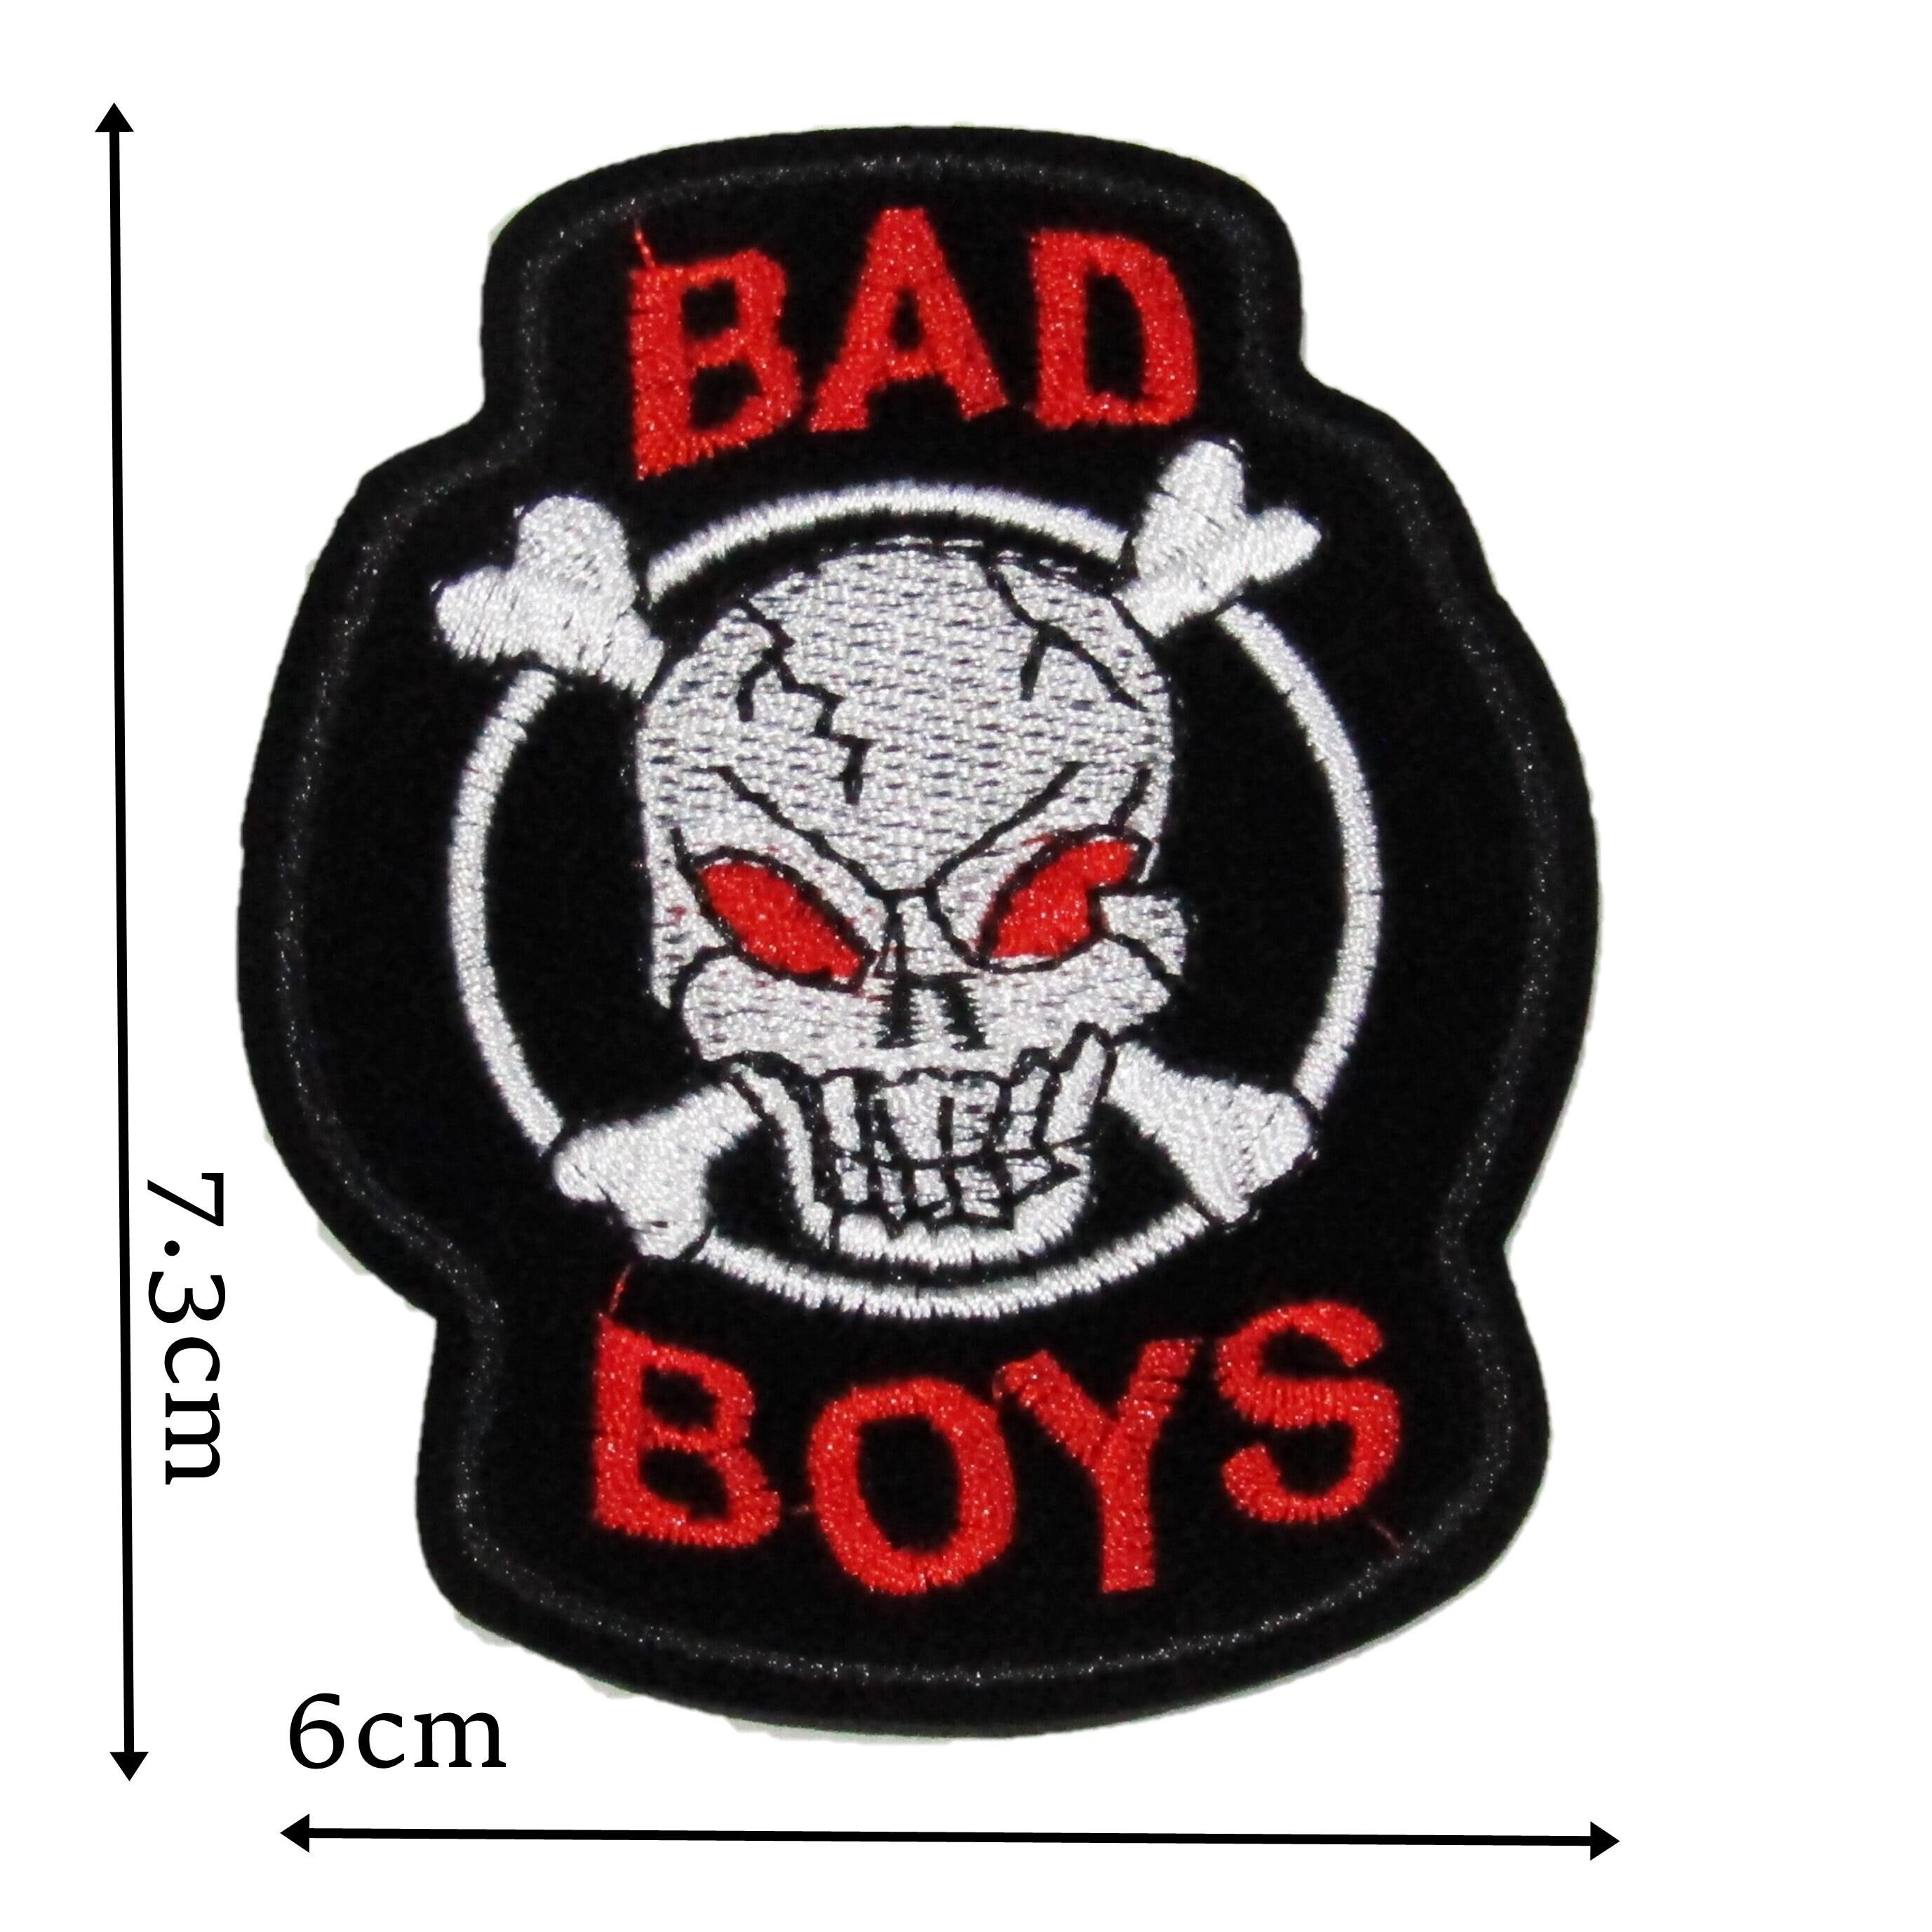 Sleeping Cat Iron On Patch Badge Motif Decoration Applique Art Design Black P485